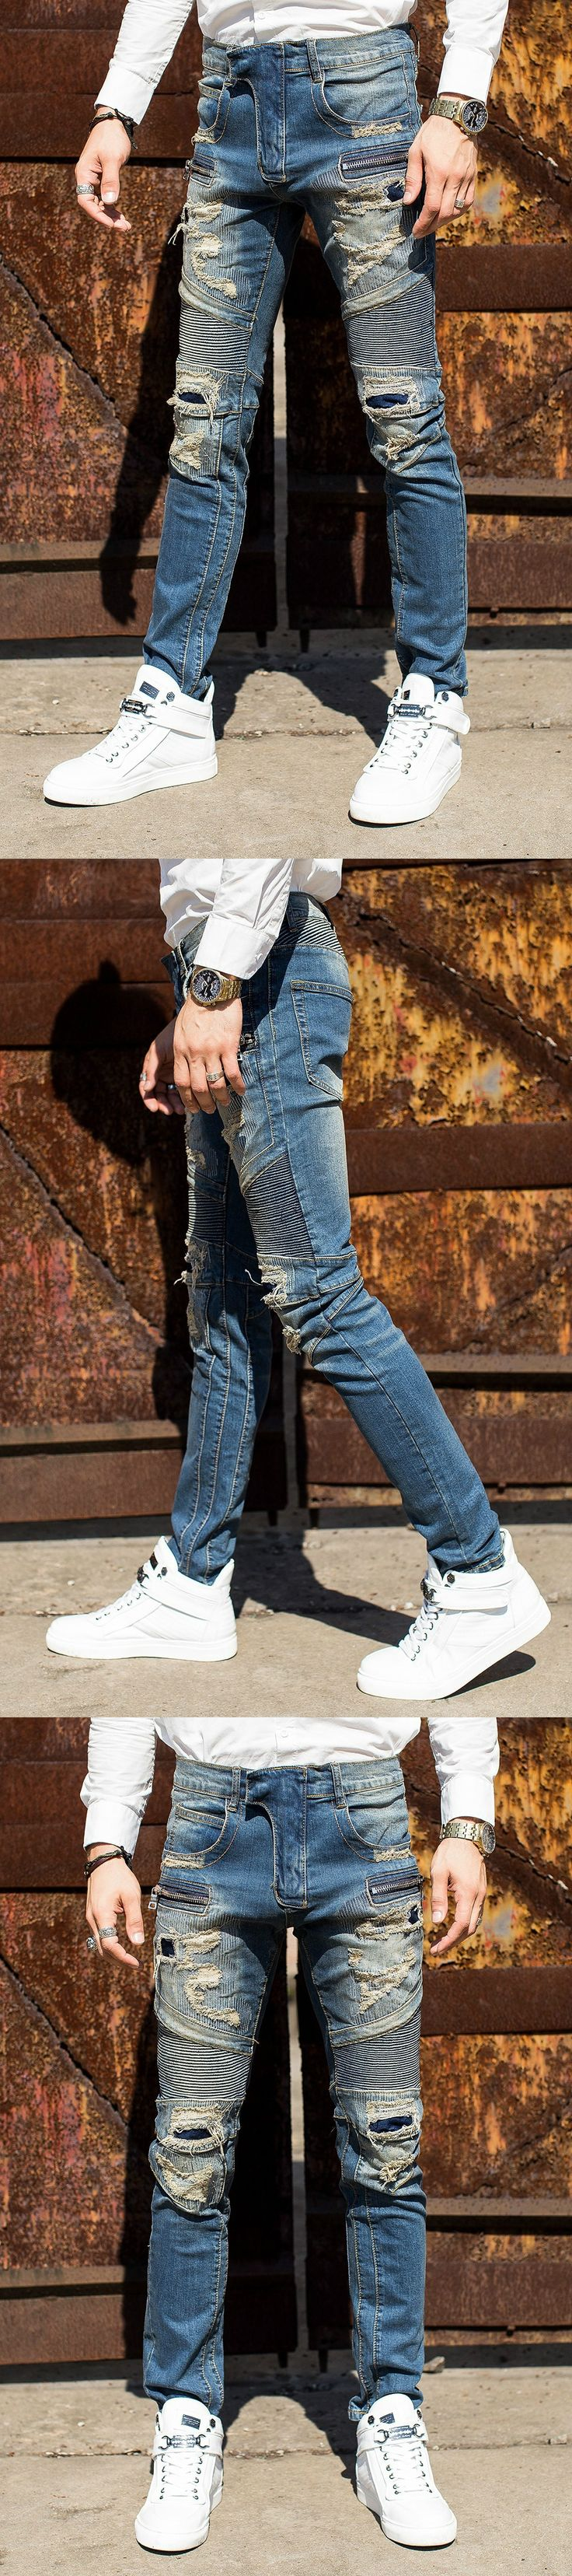 Free Shipping High Quality Men Jeans Casual Design Biker Jeans Men Slim Zipper Denim Man Jeans Hip Hop Skinny Jeans Men 29-42